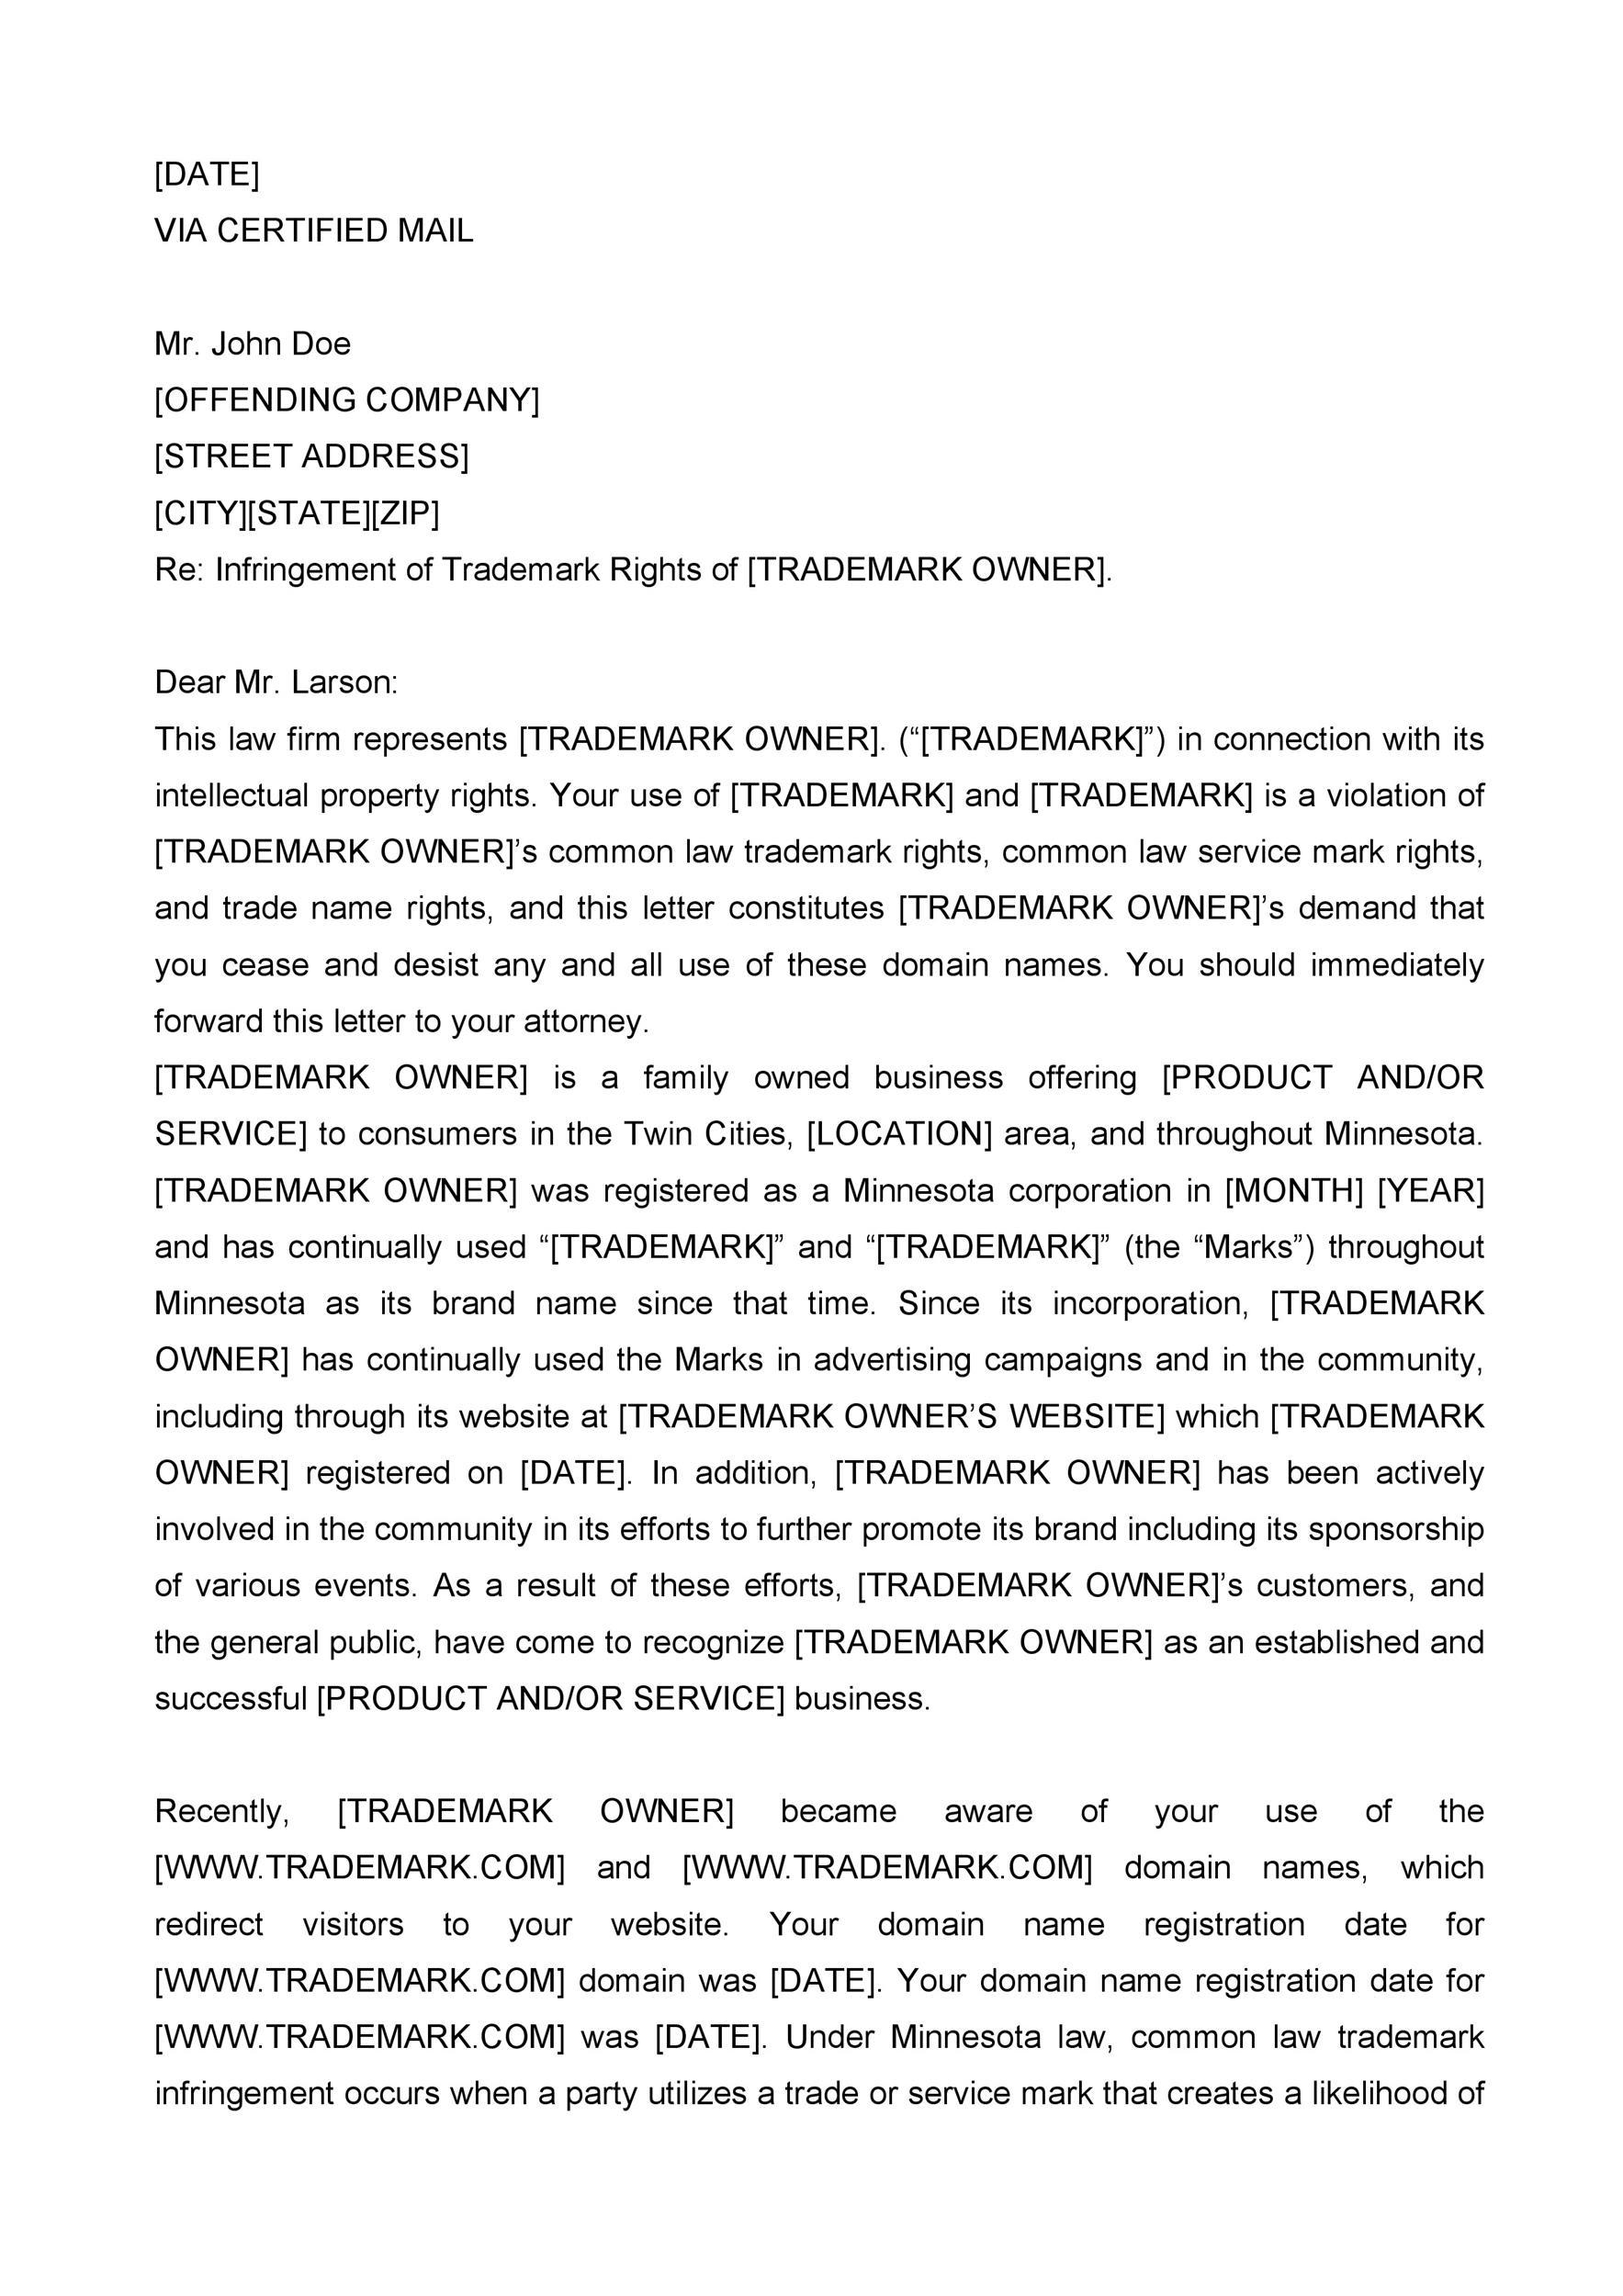 trademark cease and desist letter sample - Dolapmagnetband - Cease And Desist Letter Sample